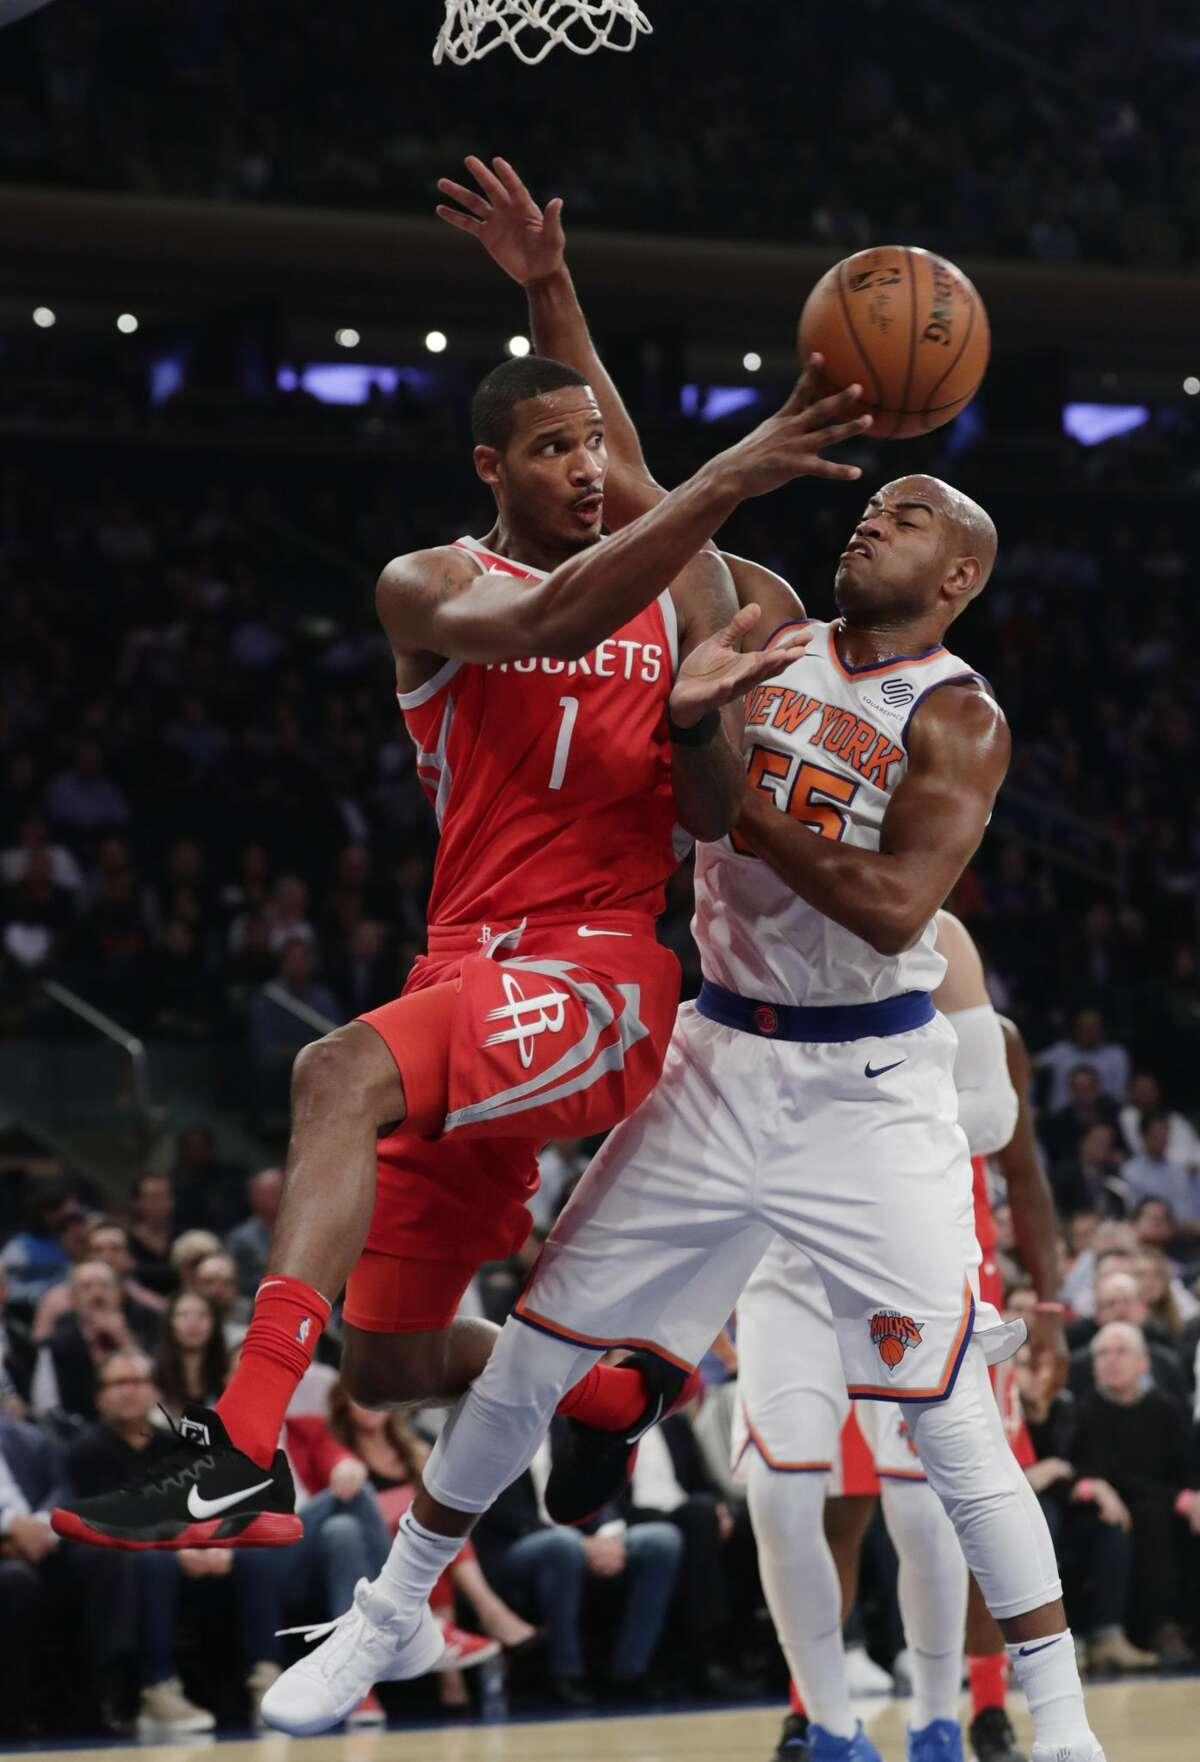 Houston Rockets' Trevor Ariza (1) passes away from New York Knicks' Jarrett Jack (55) during the first half of an NBA basketball game Wednesday, Nov. 1, 2017, in New York. (AP Photo/Frank Franklin II)